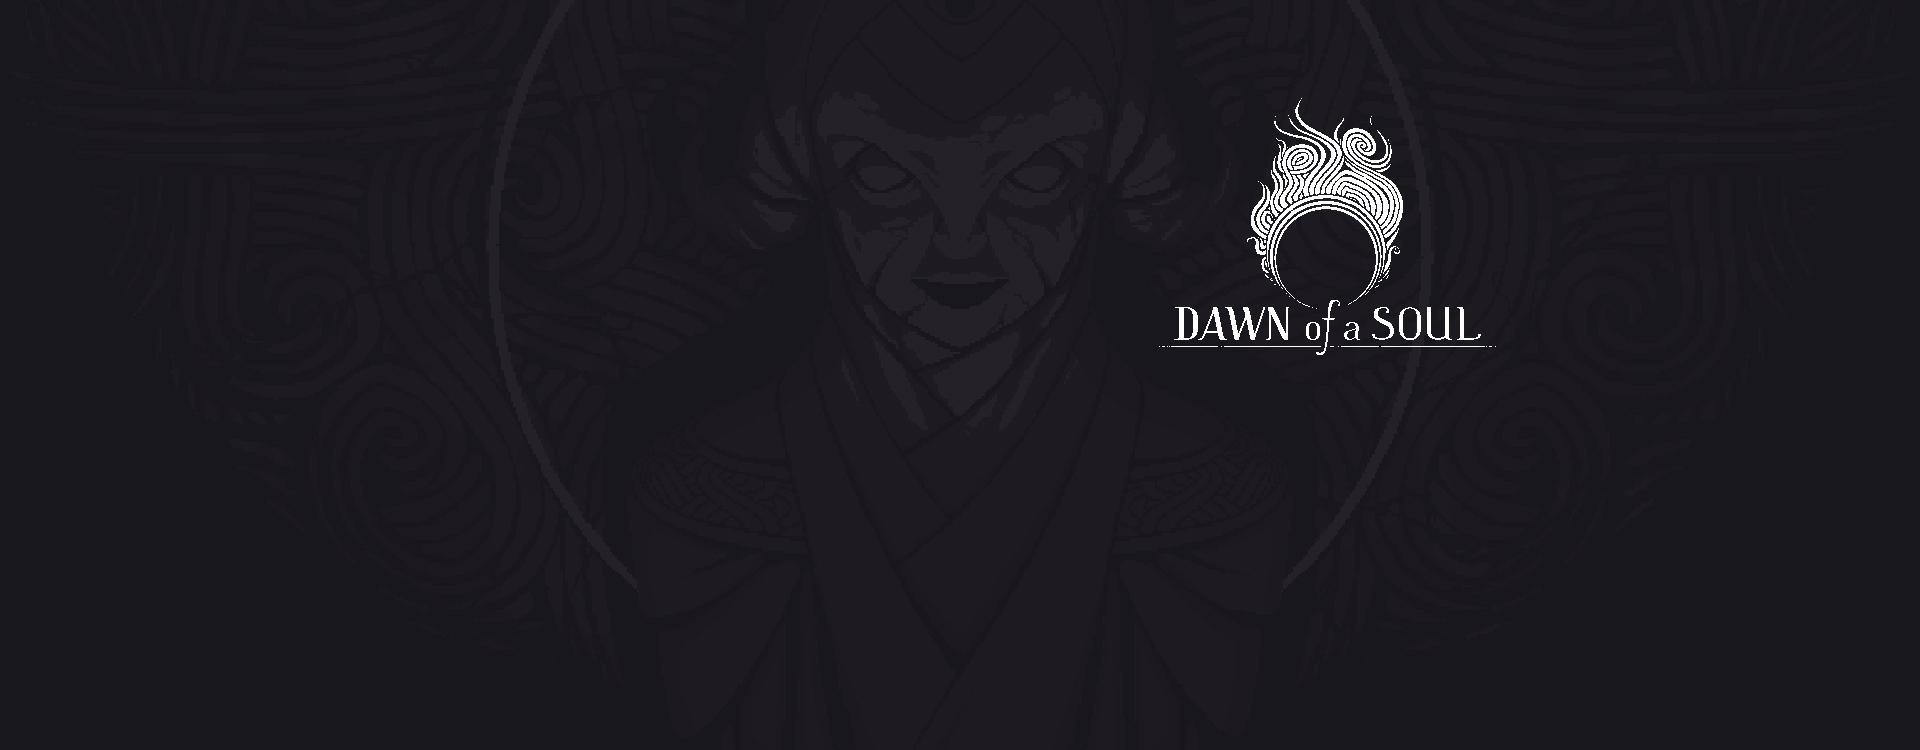 Dawn of a Soul